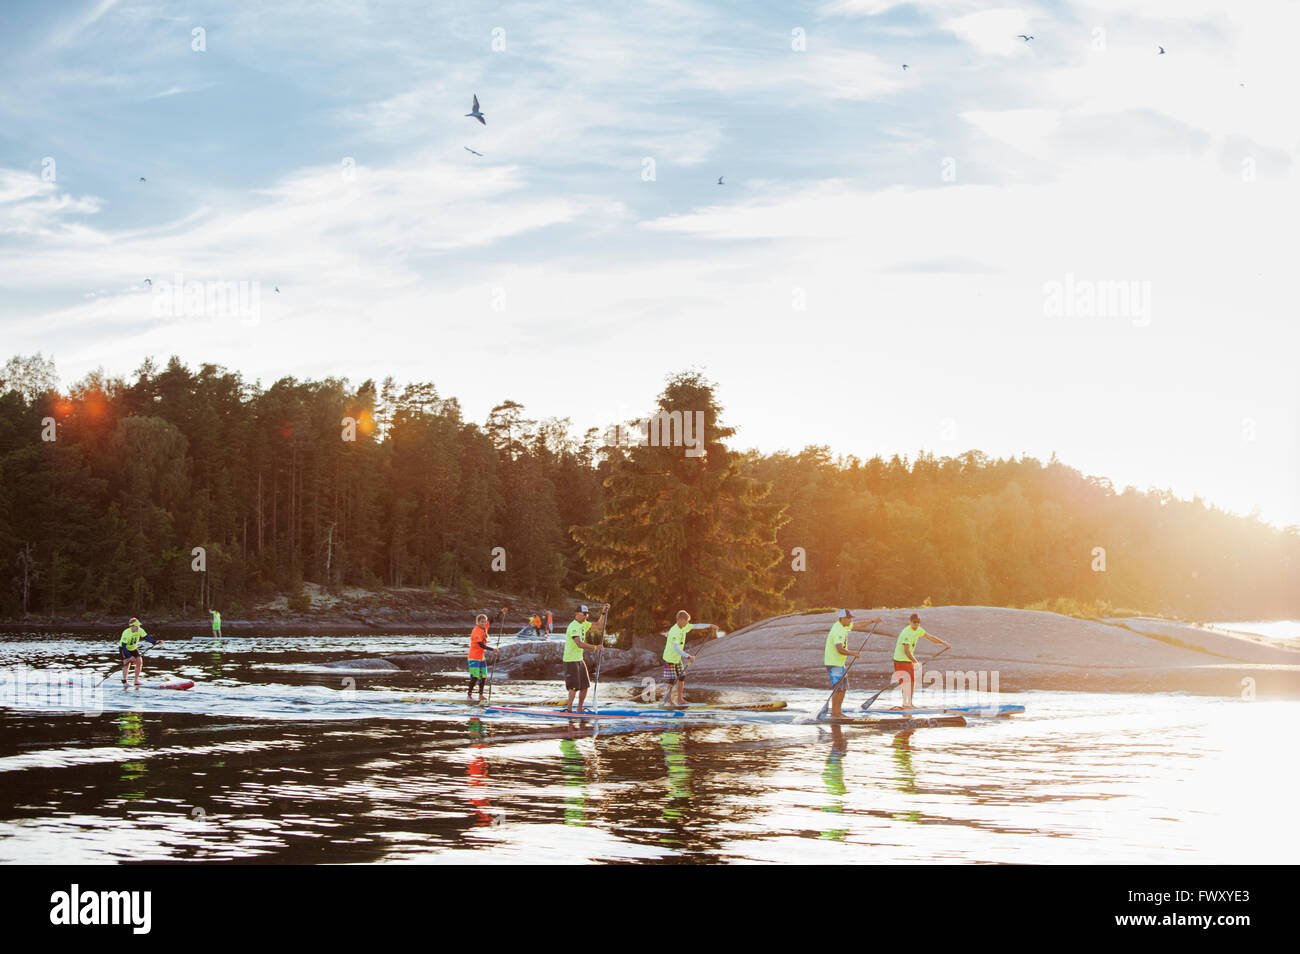 Finlandia, Varsinais-Suomi, Eura, remaban por la orilla durante la carrera Imagen De Stock